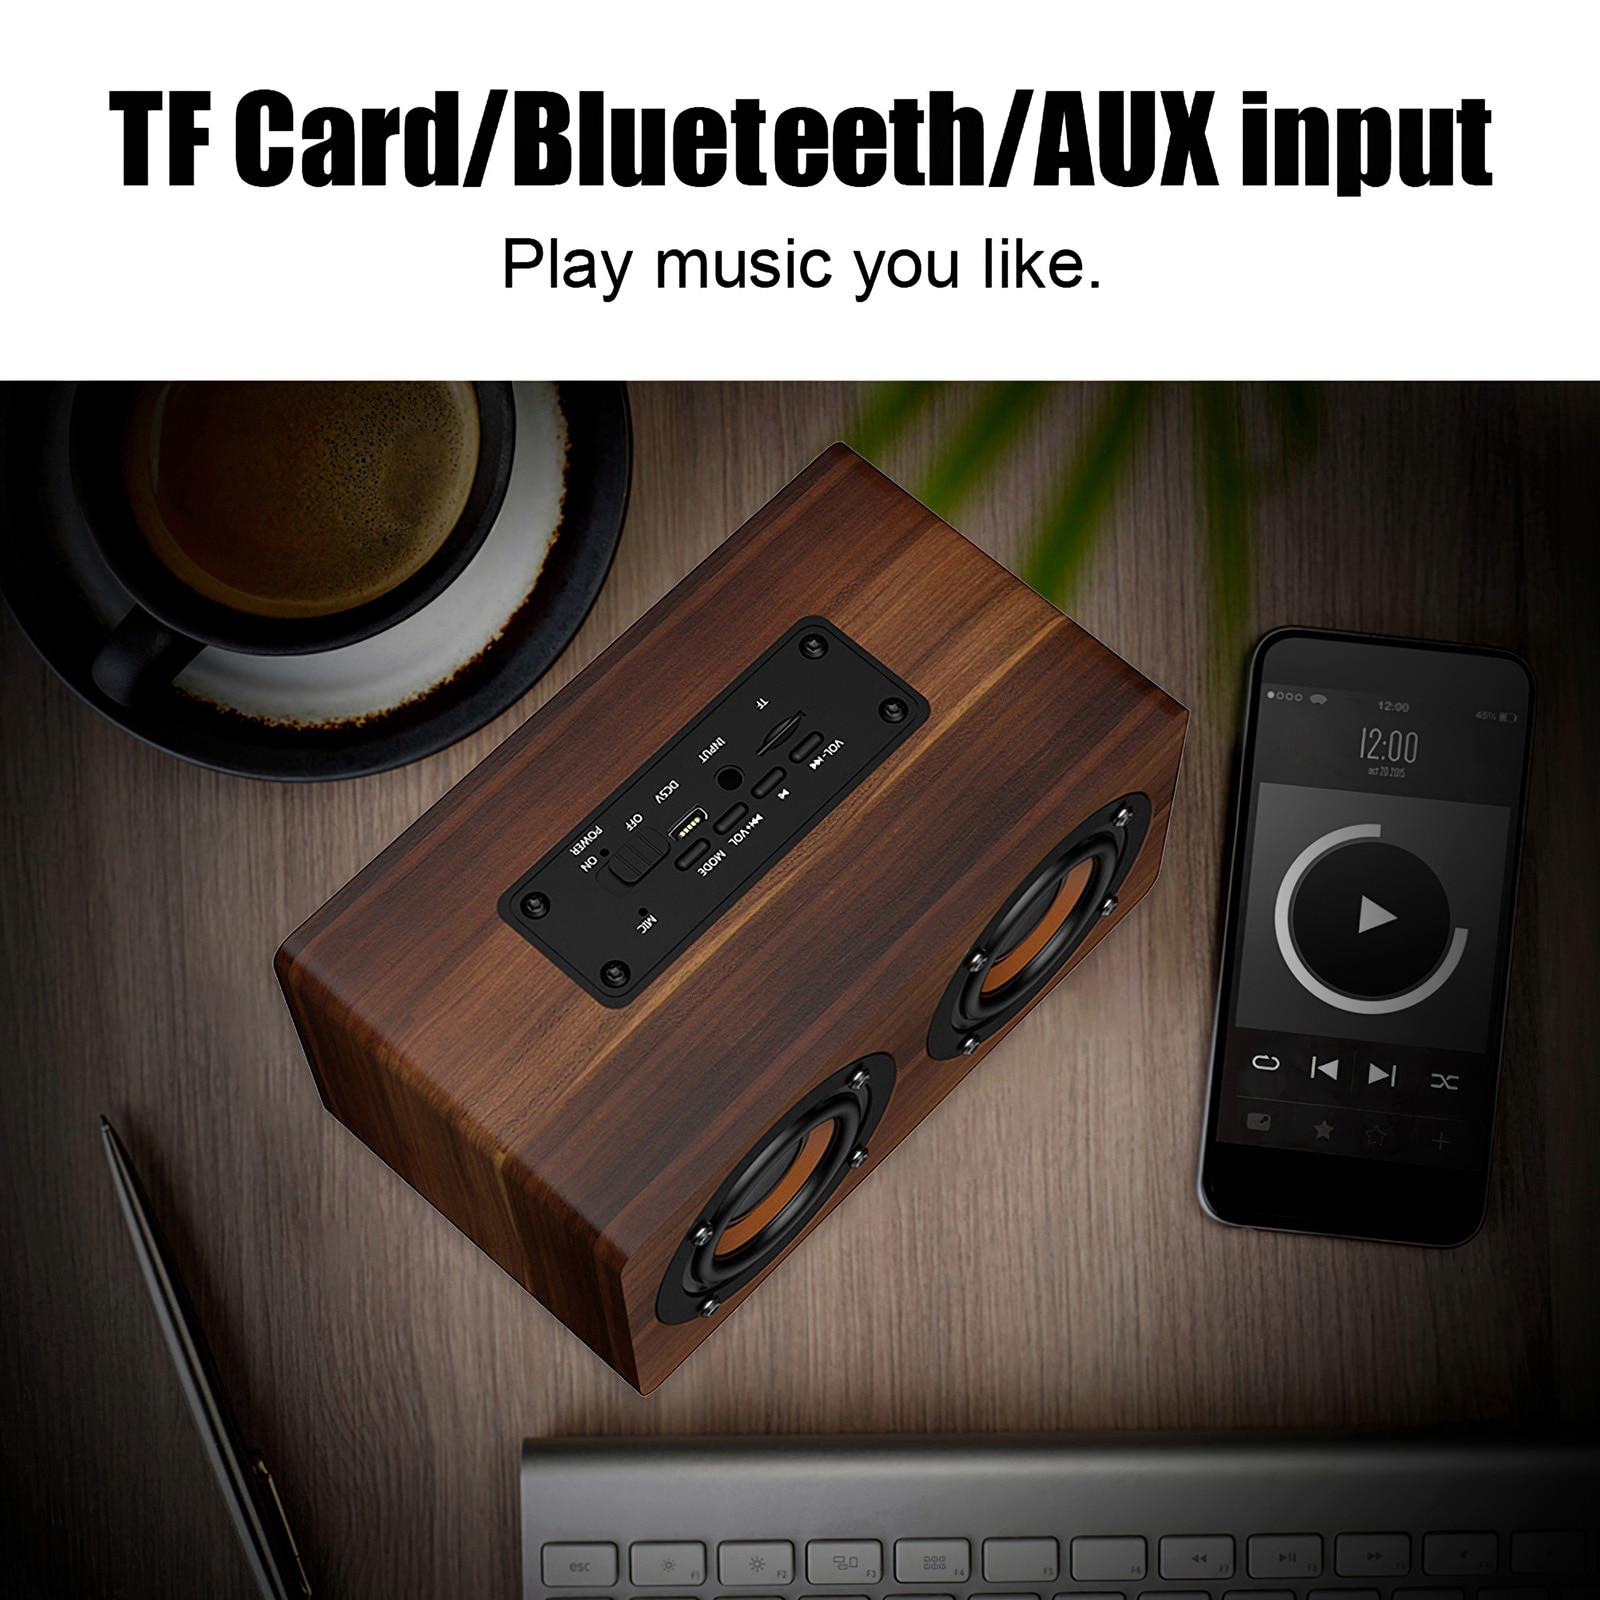 LED Digital Alarm Clock Bluetooth Loudspeaker USB Rechargeable Wireless Sound Box Built-in Microphone TF Card FM Radio Speaker enlarge